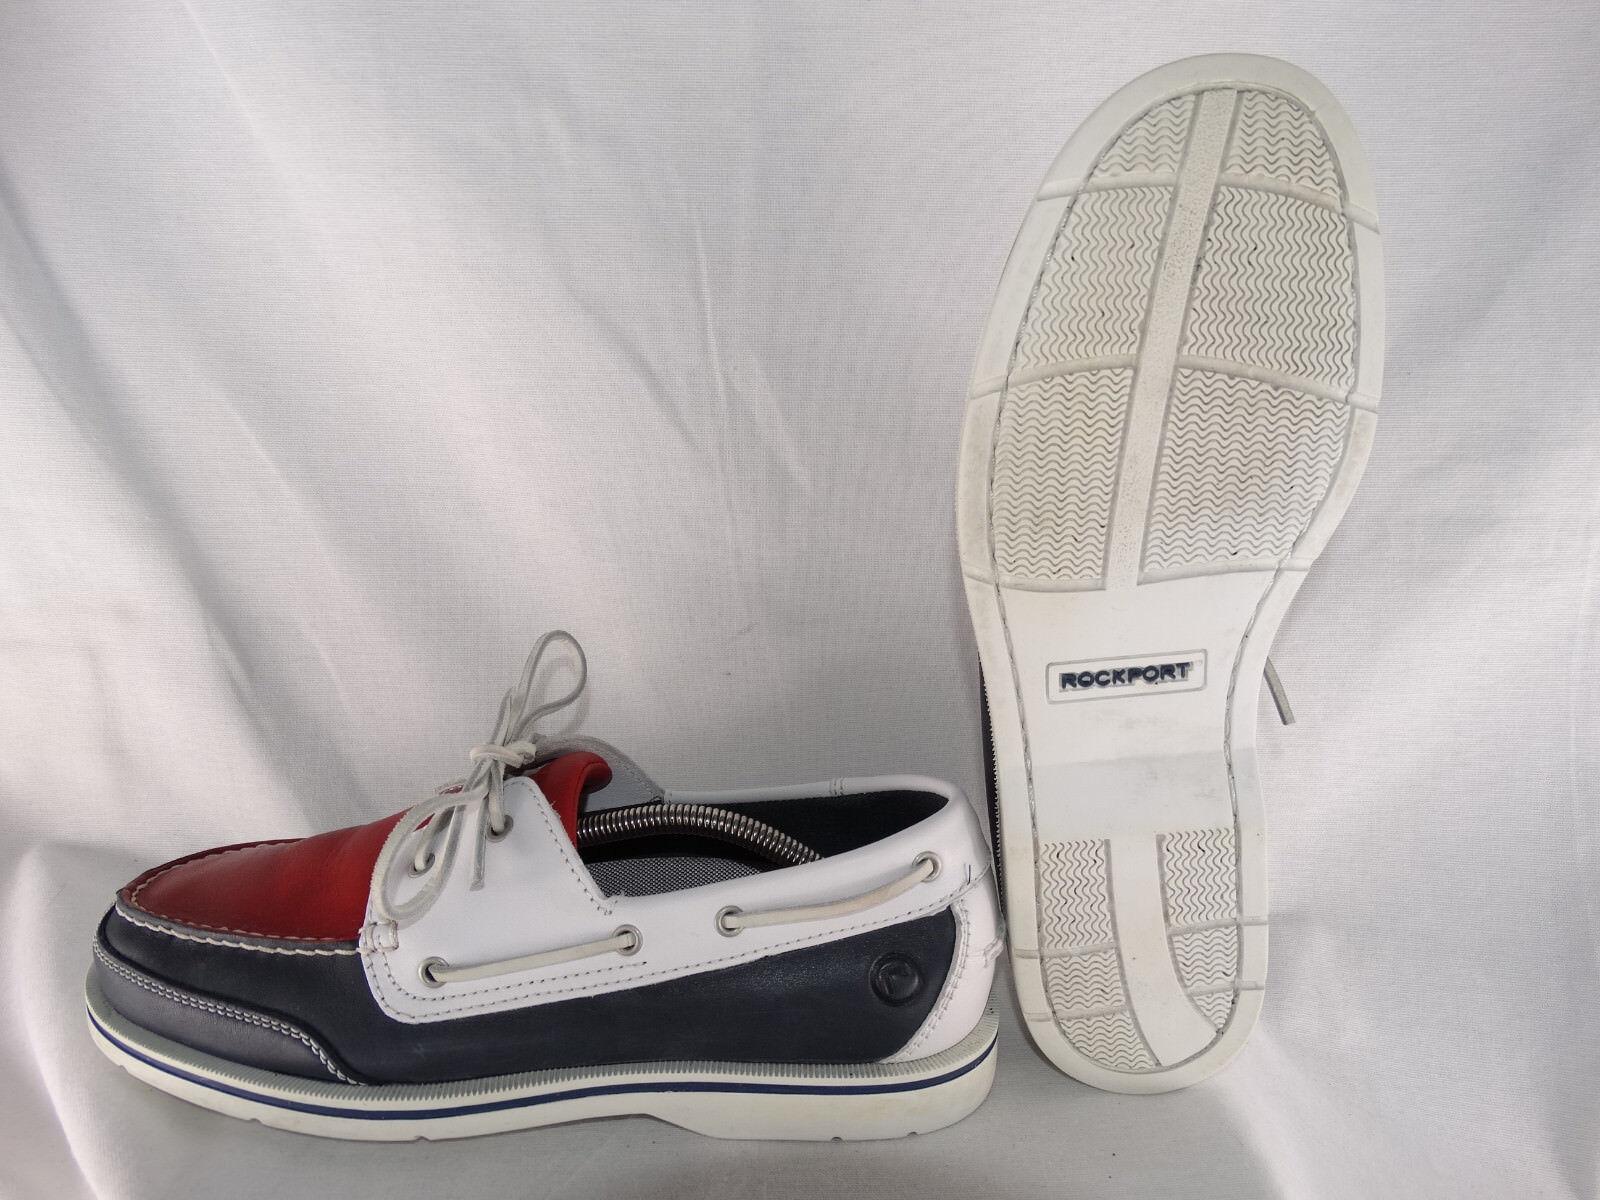 Rockport 2 Eye Boat Schuhe Deckschuhe weiß-blau-rot EU 44,5 US 10,5 Medium